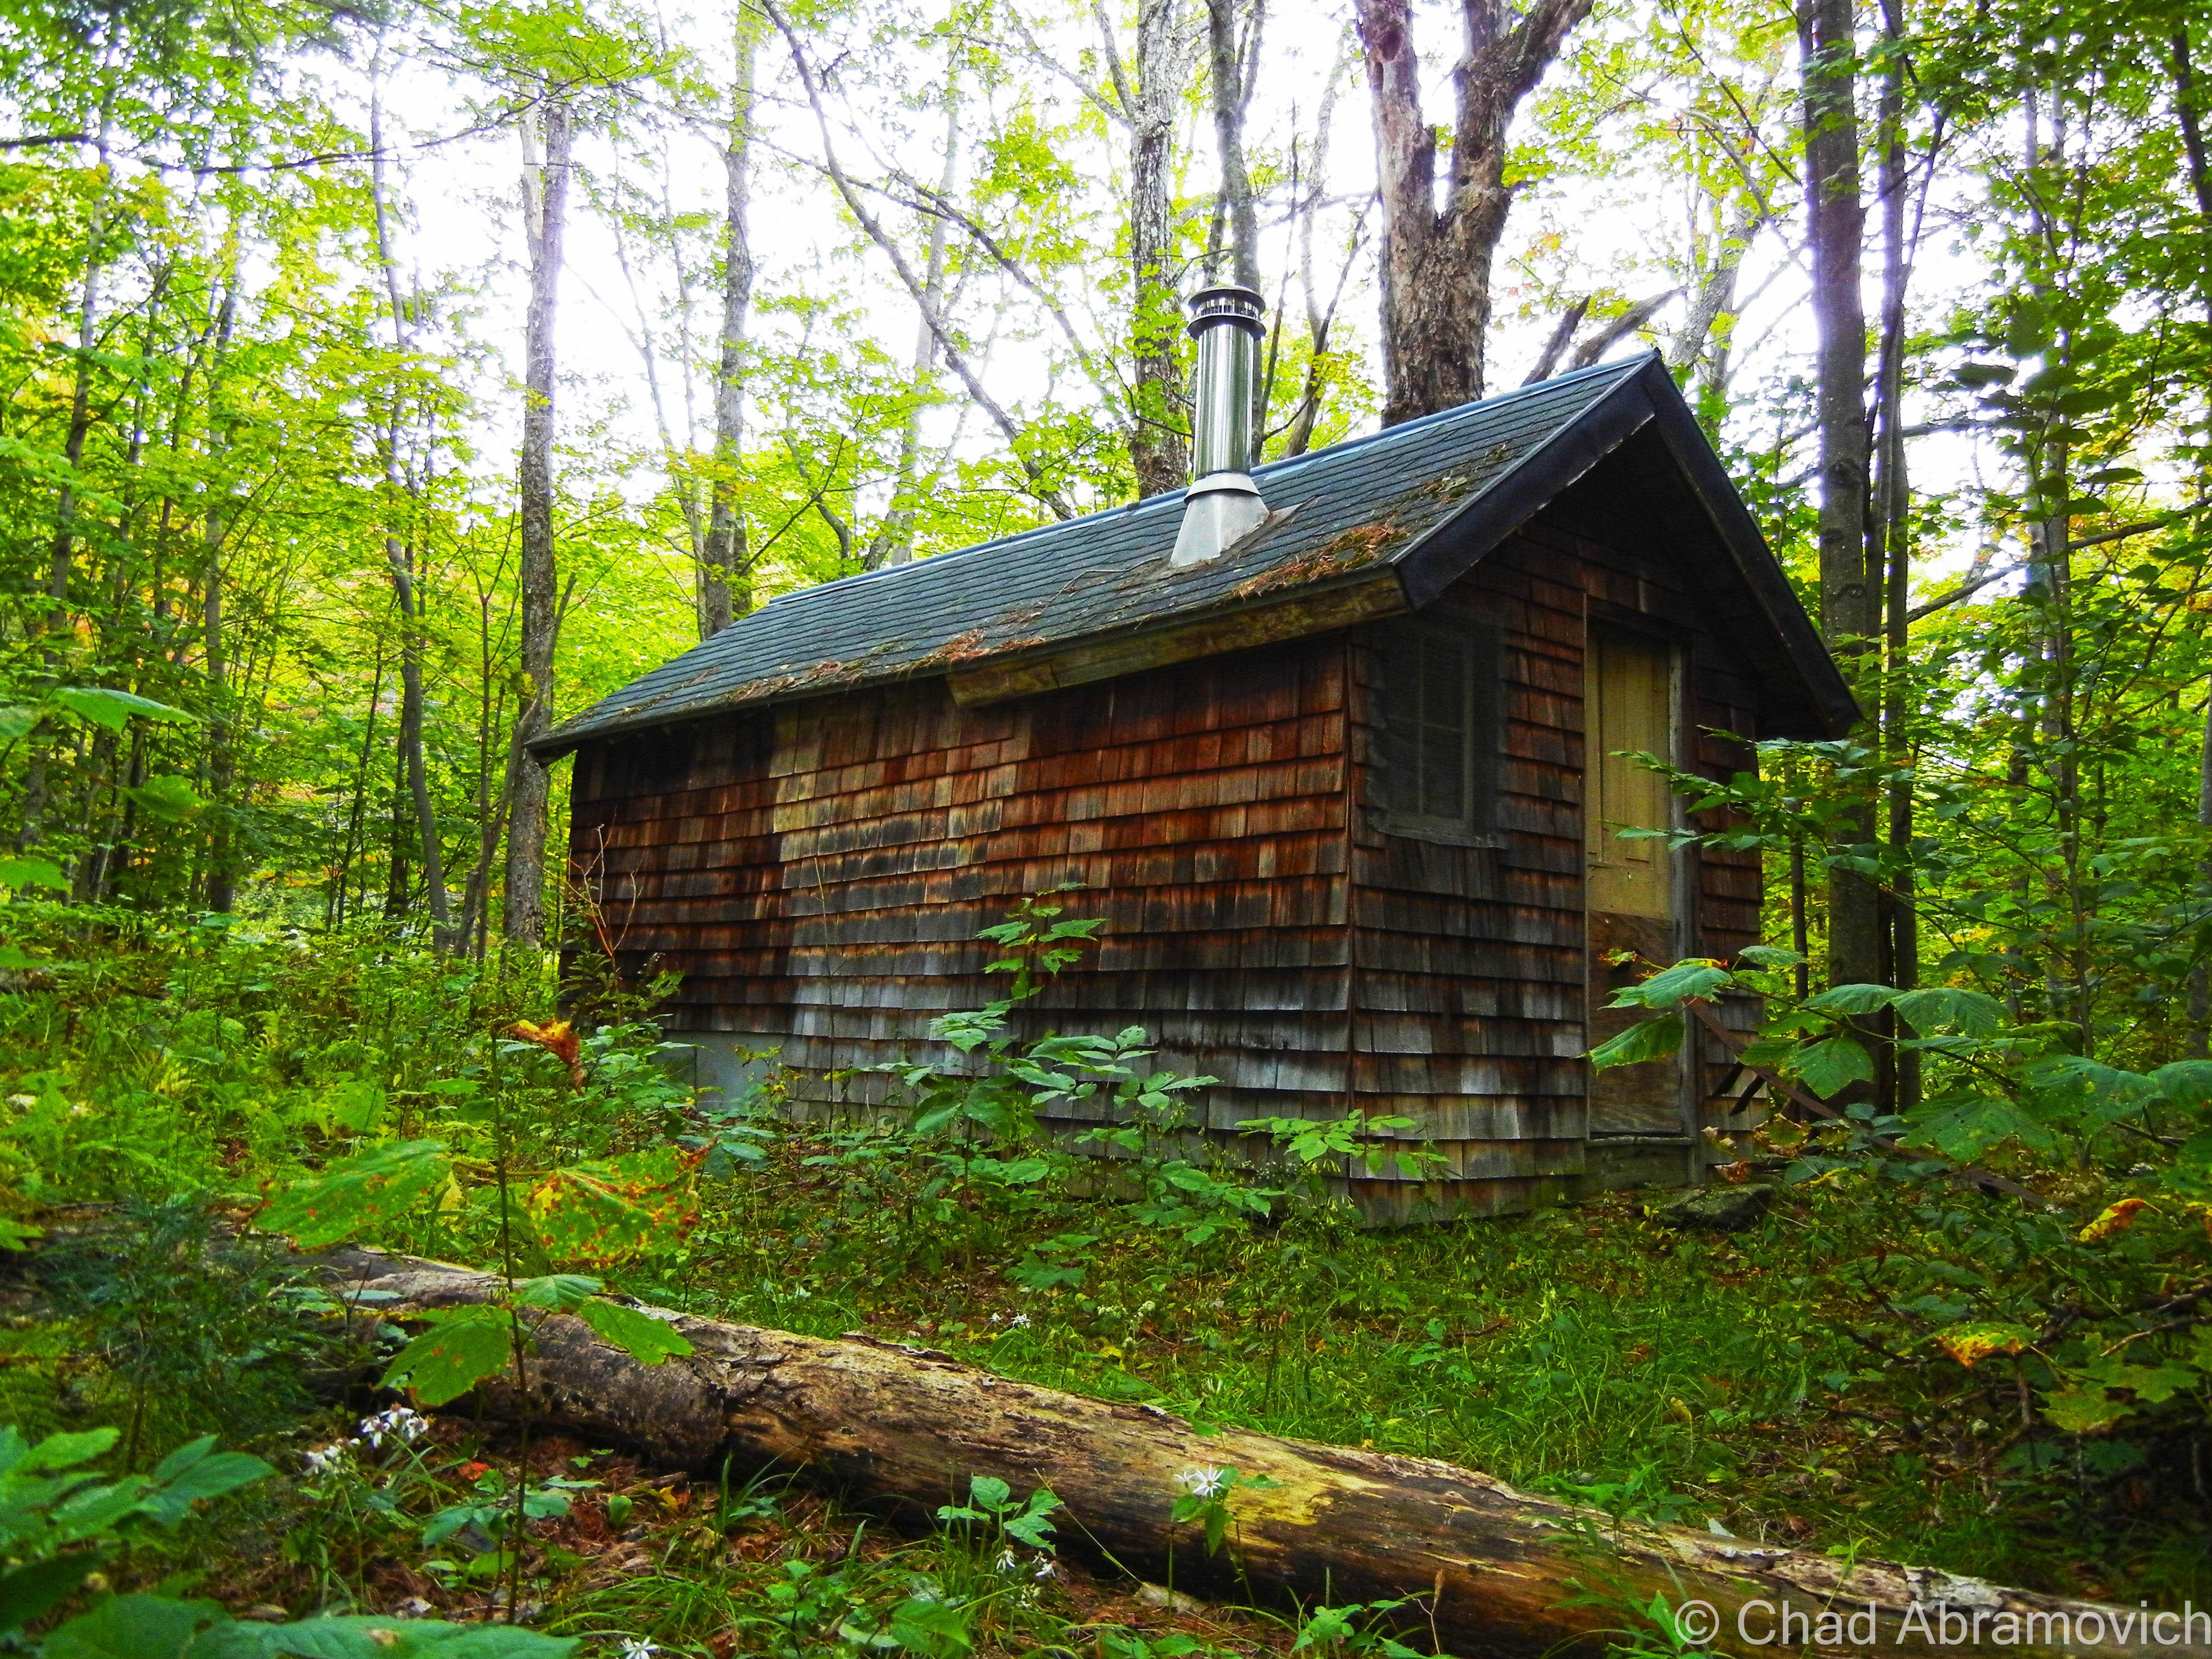 Abandoned Summer Camp